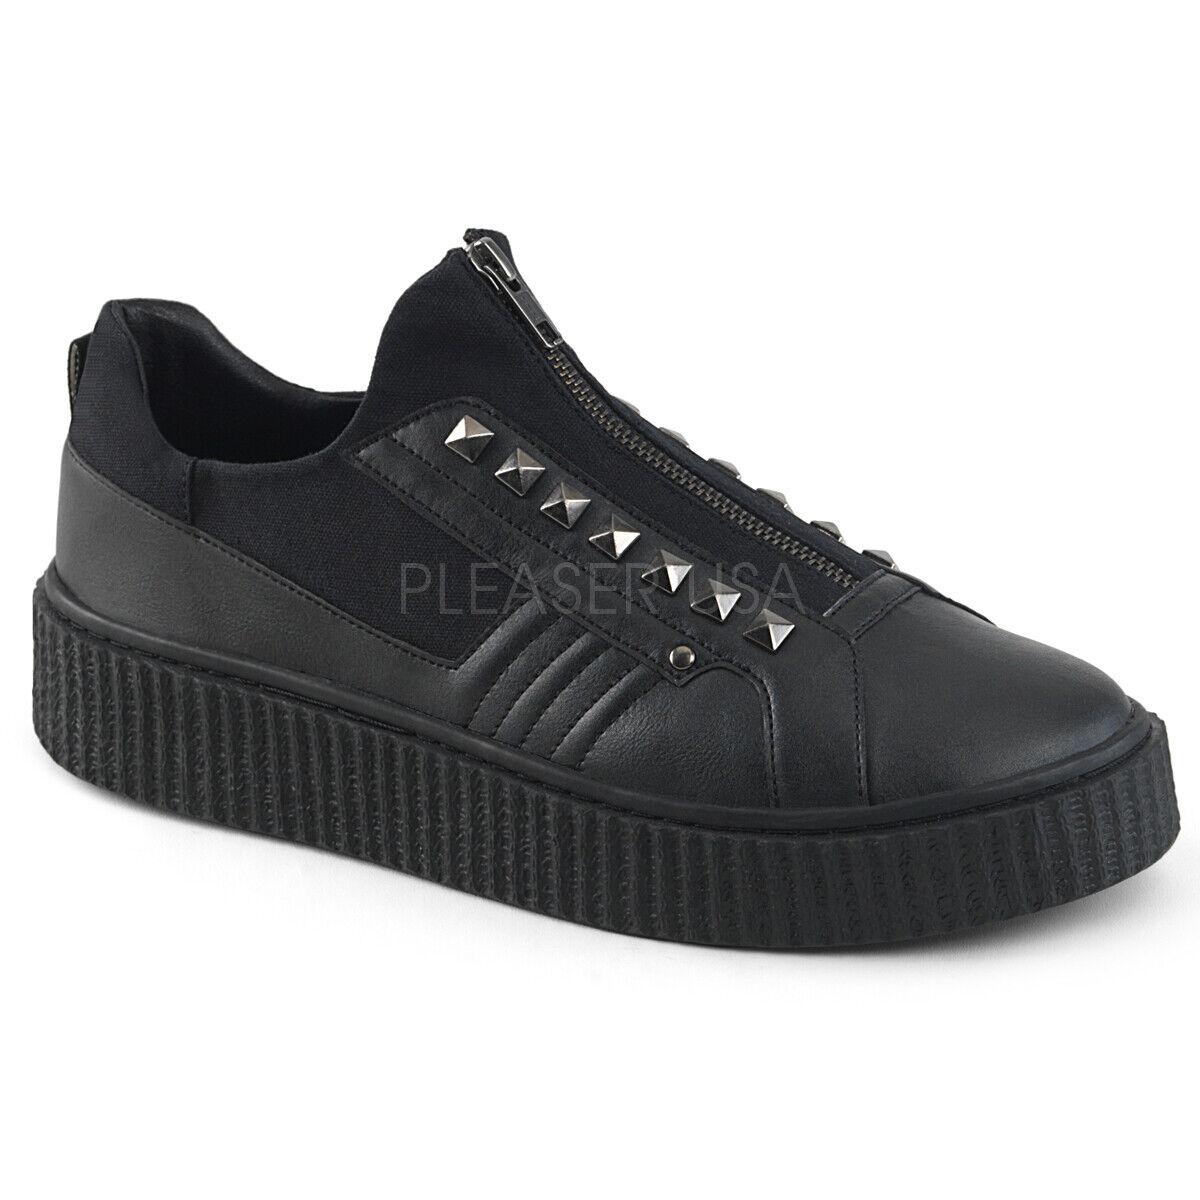 Demonia 1.5  nero Canvas Studded Zipper Low Top Creeper scarpe da ginnastica scarpe 4-13